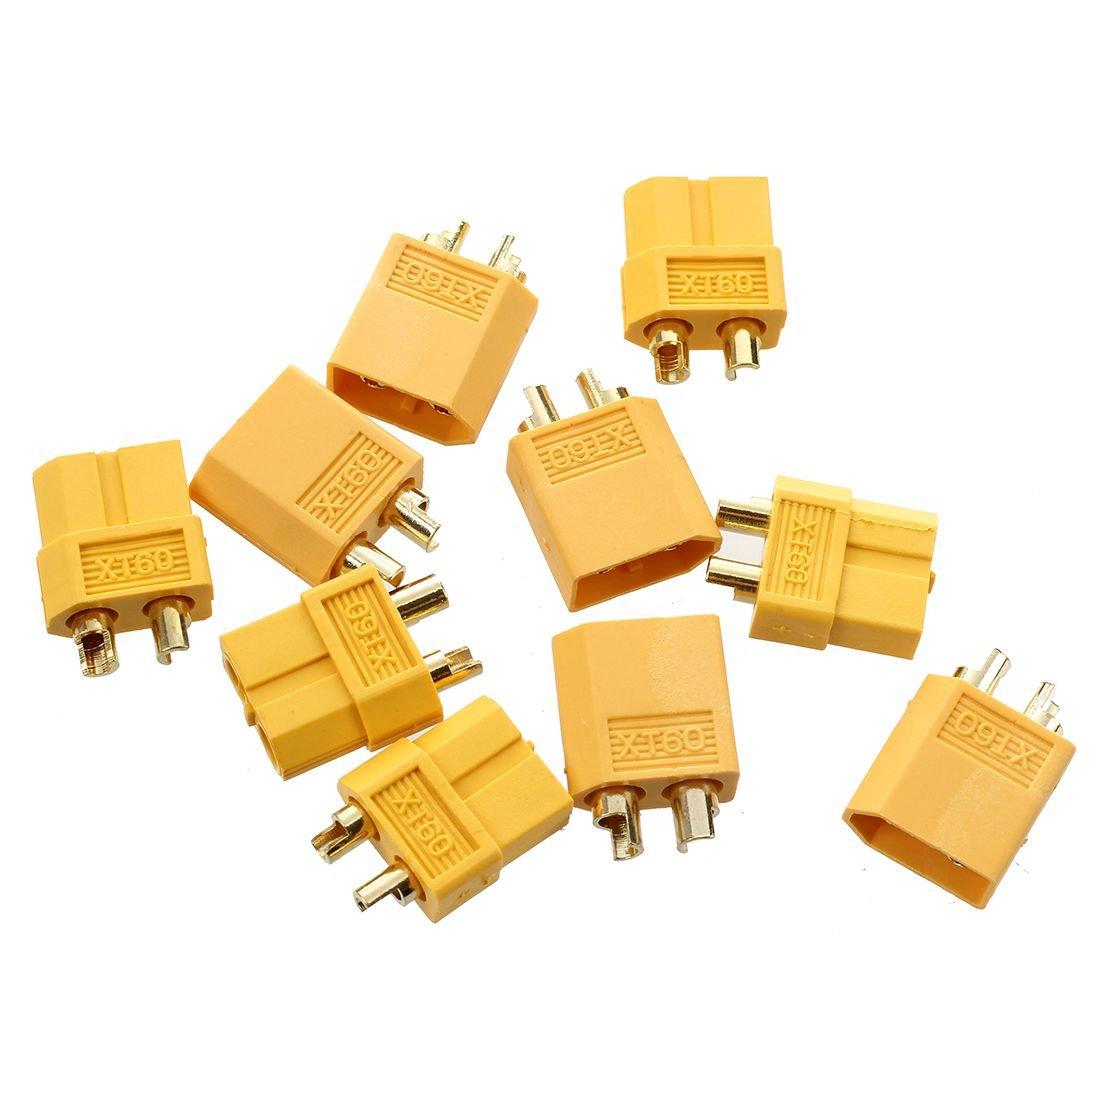 TOOGOO (R) 5 Paar Nylon XT60 T-Plug Lipo Hochstrom Stecker Buchse RC Set Goldstecker Adapter Gelb 041857